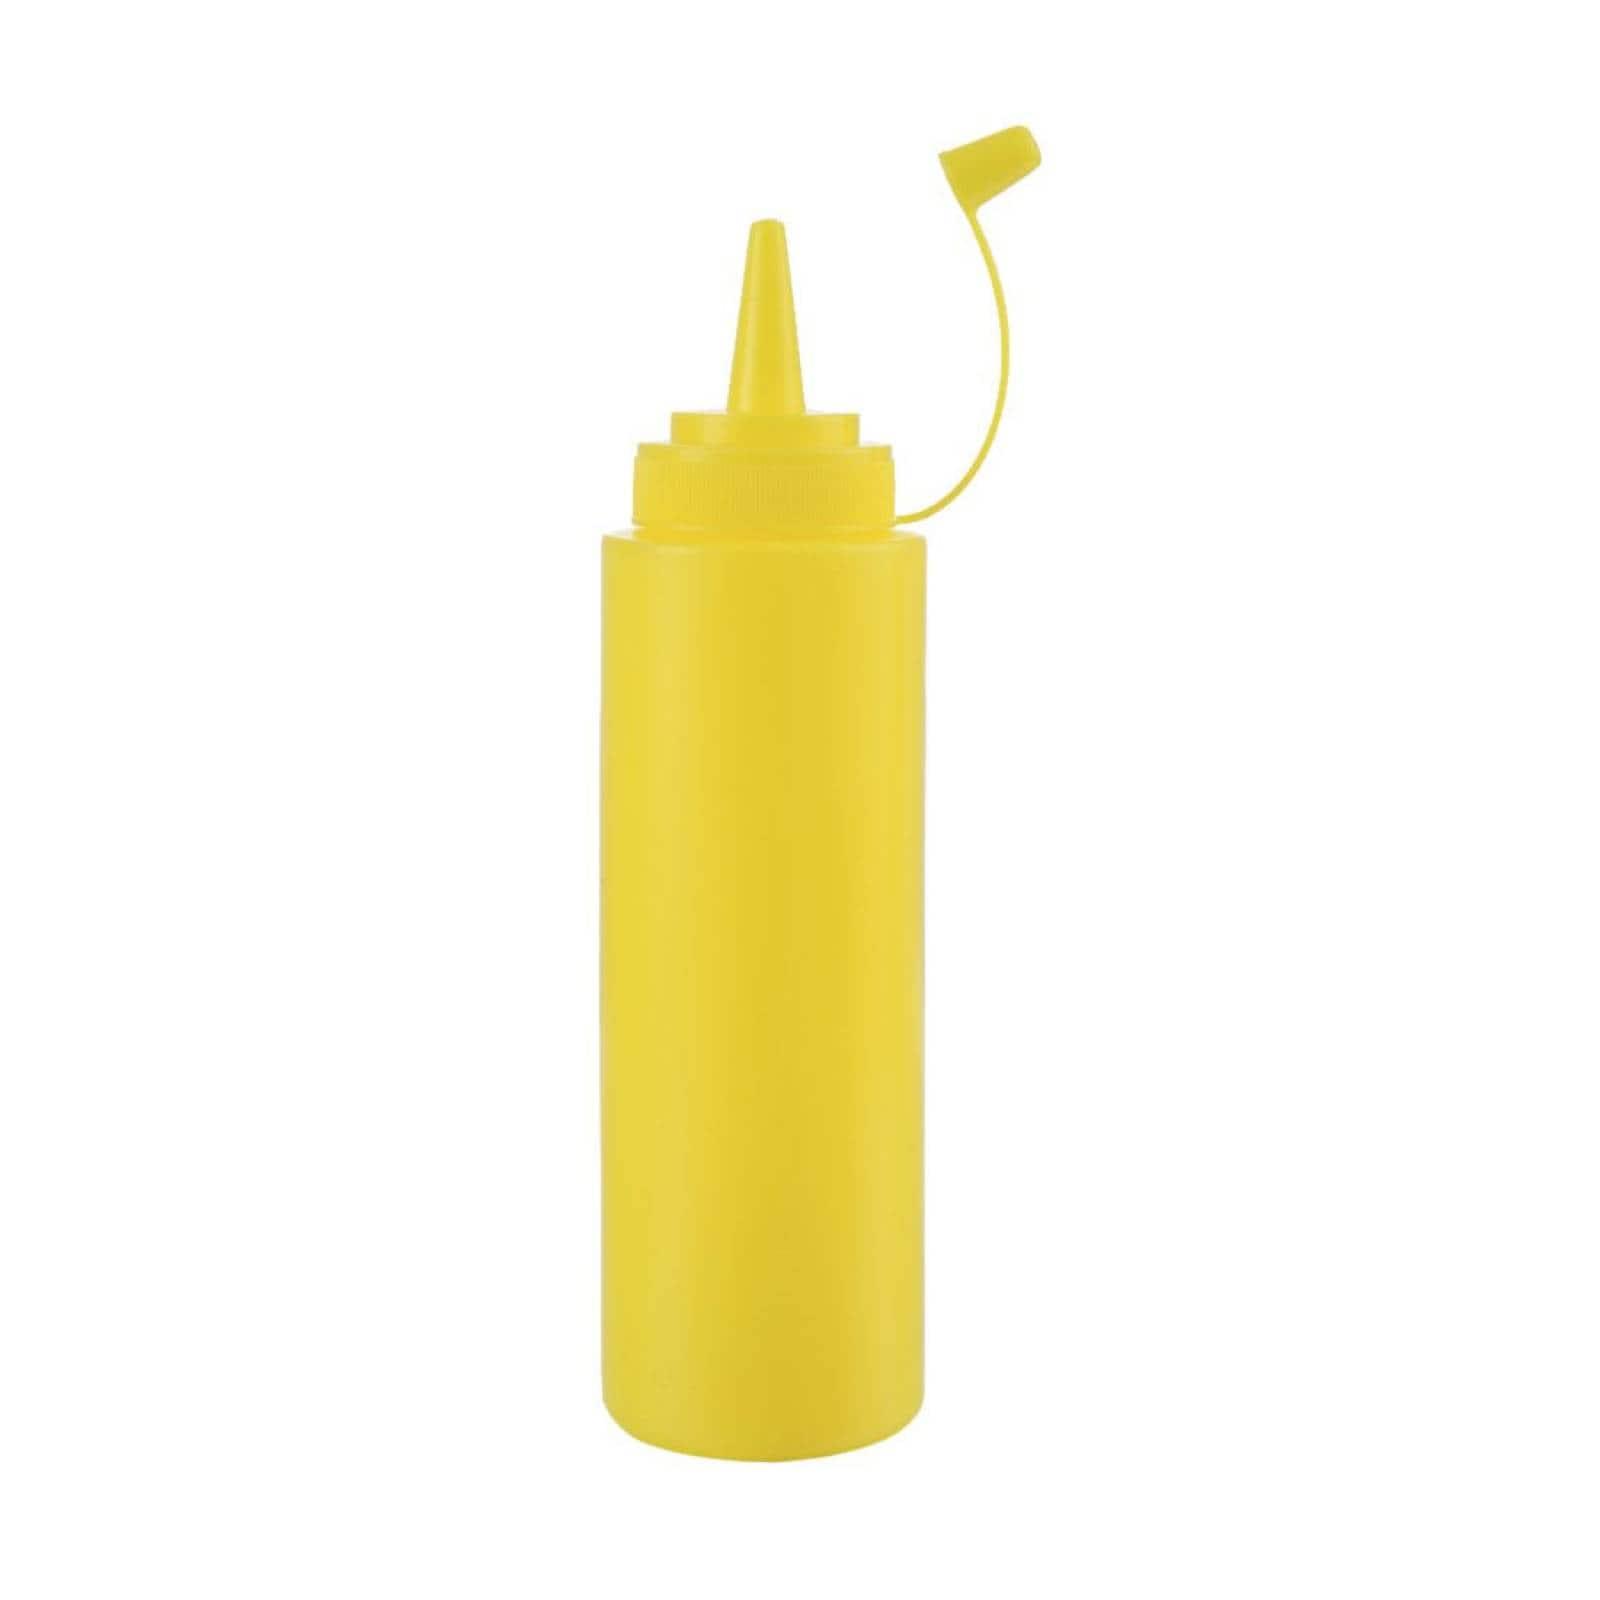 Botella Plástica Squeeze Dispensador 1/2 Torosqui Assorted